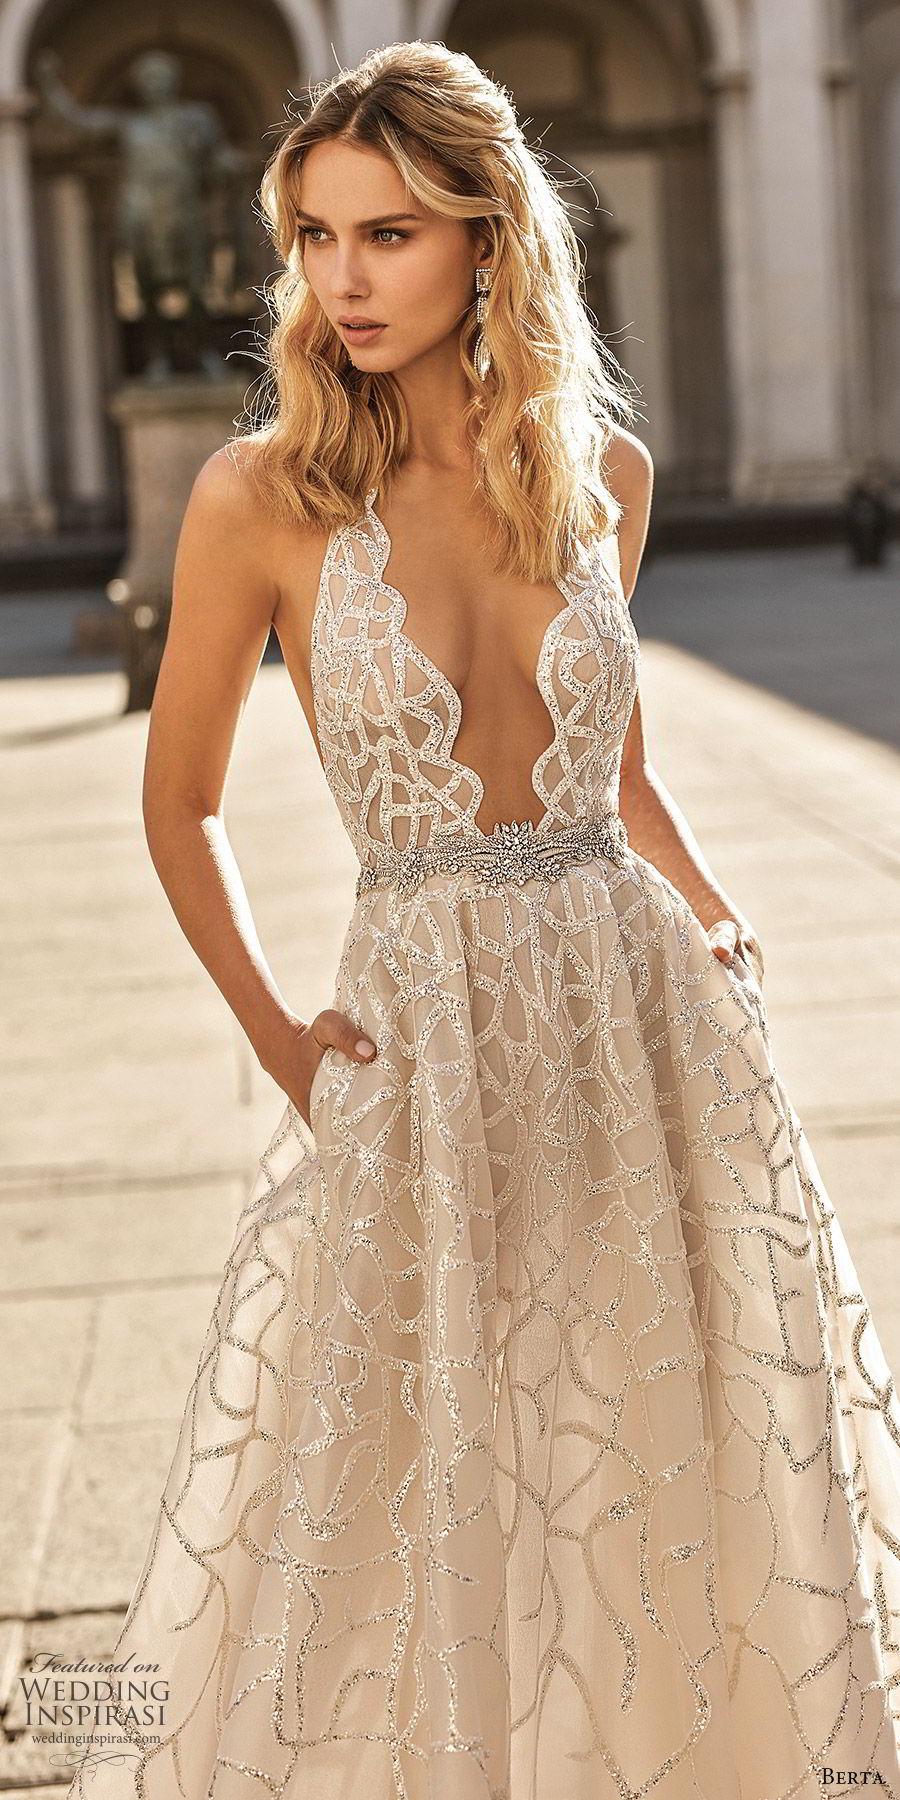 berta spring 2020 bridal sleeveless hatler neck plunging neckline fully embellished a line ball gown wedding dress (14) champagne glitzy princess chapel train zv